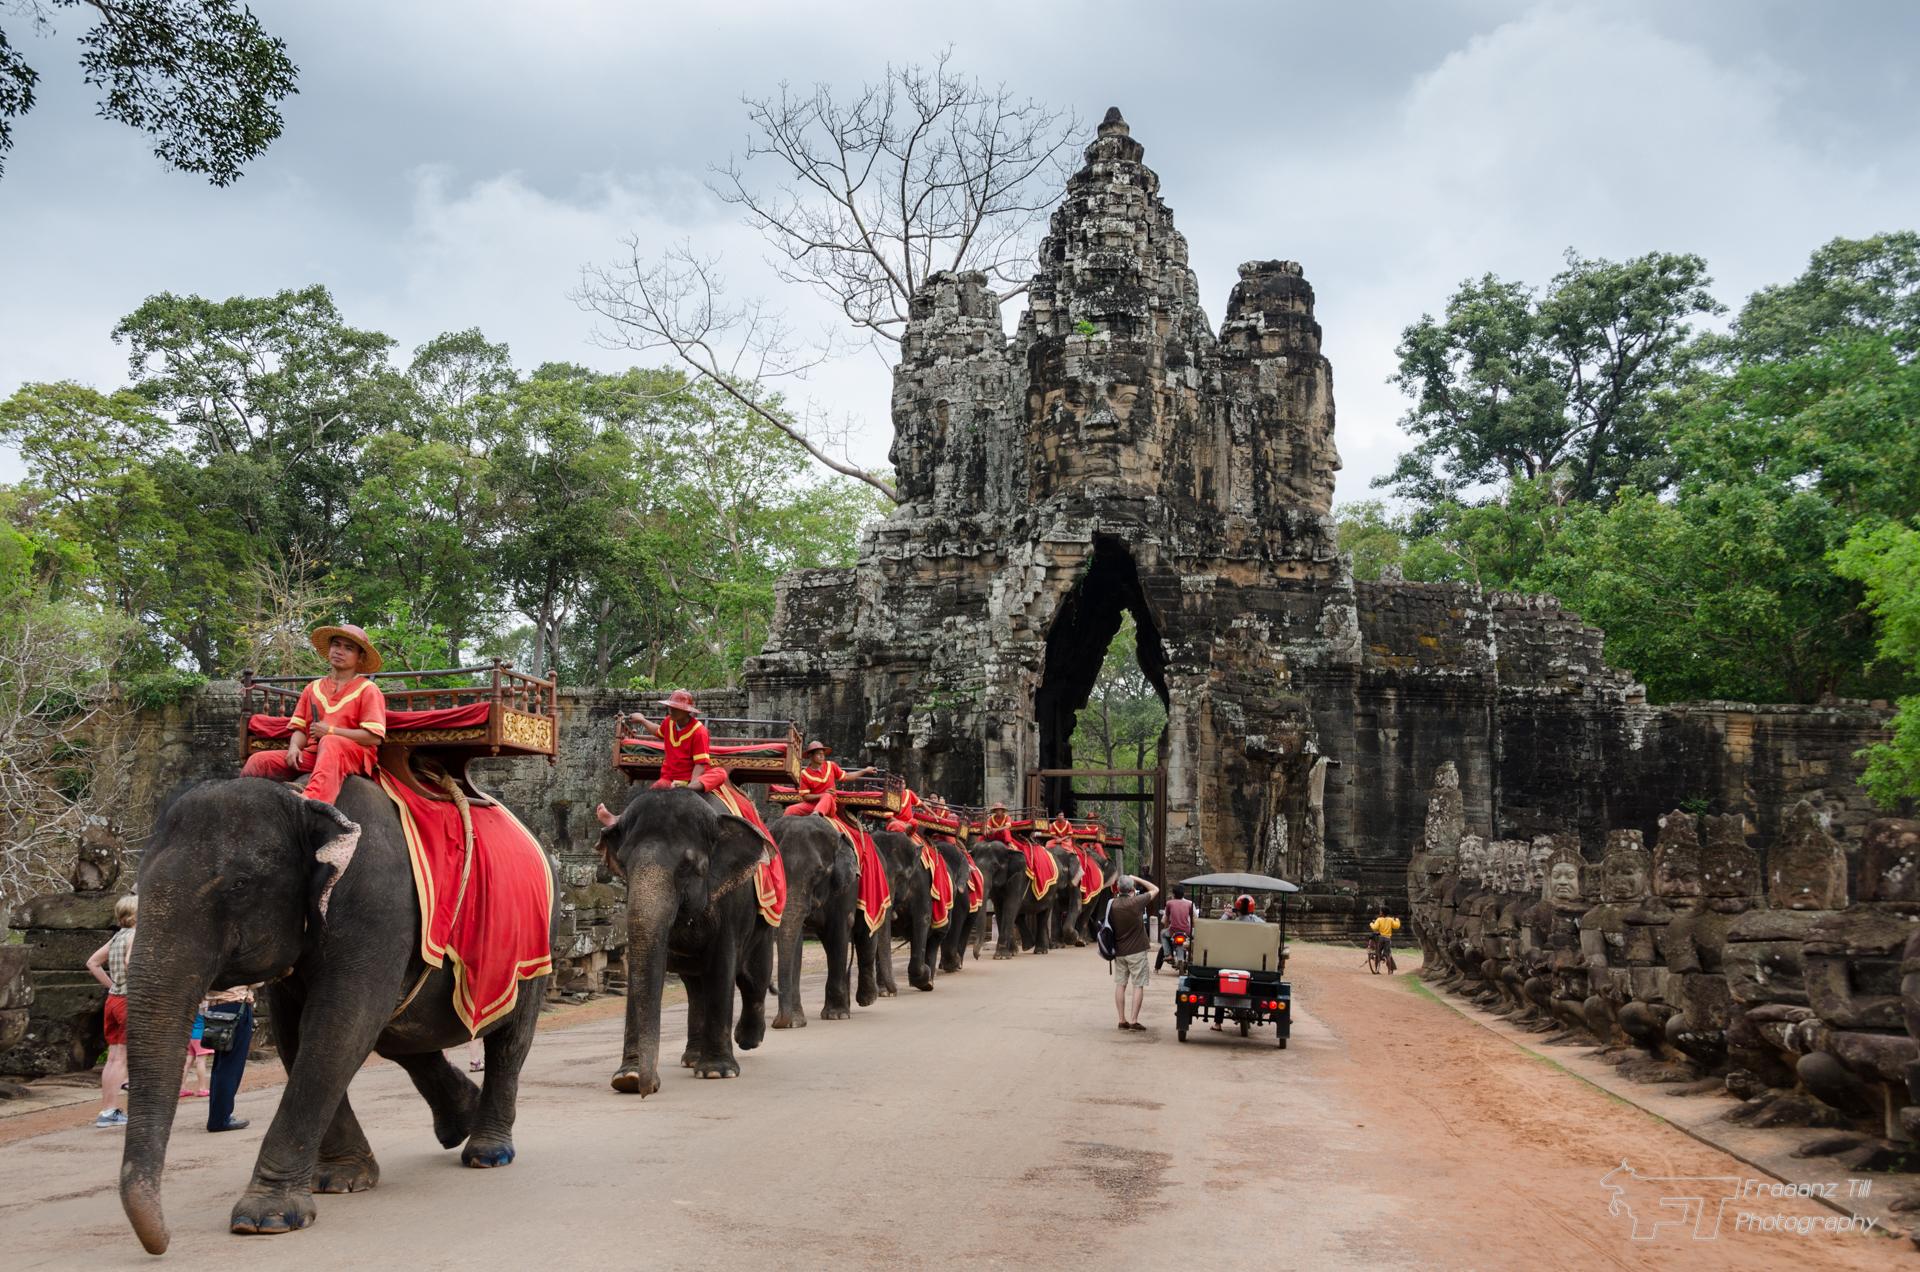 High Resolution Wallpaper | Angkor Thom 1920x1272 px